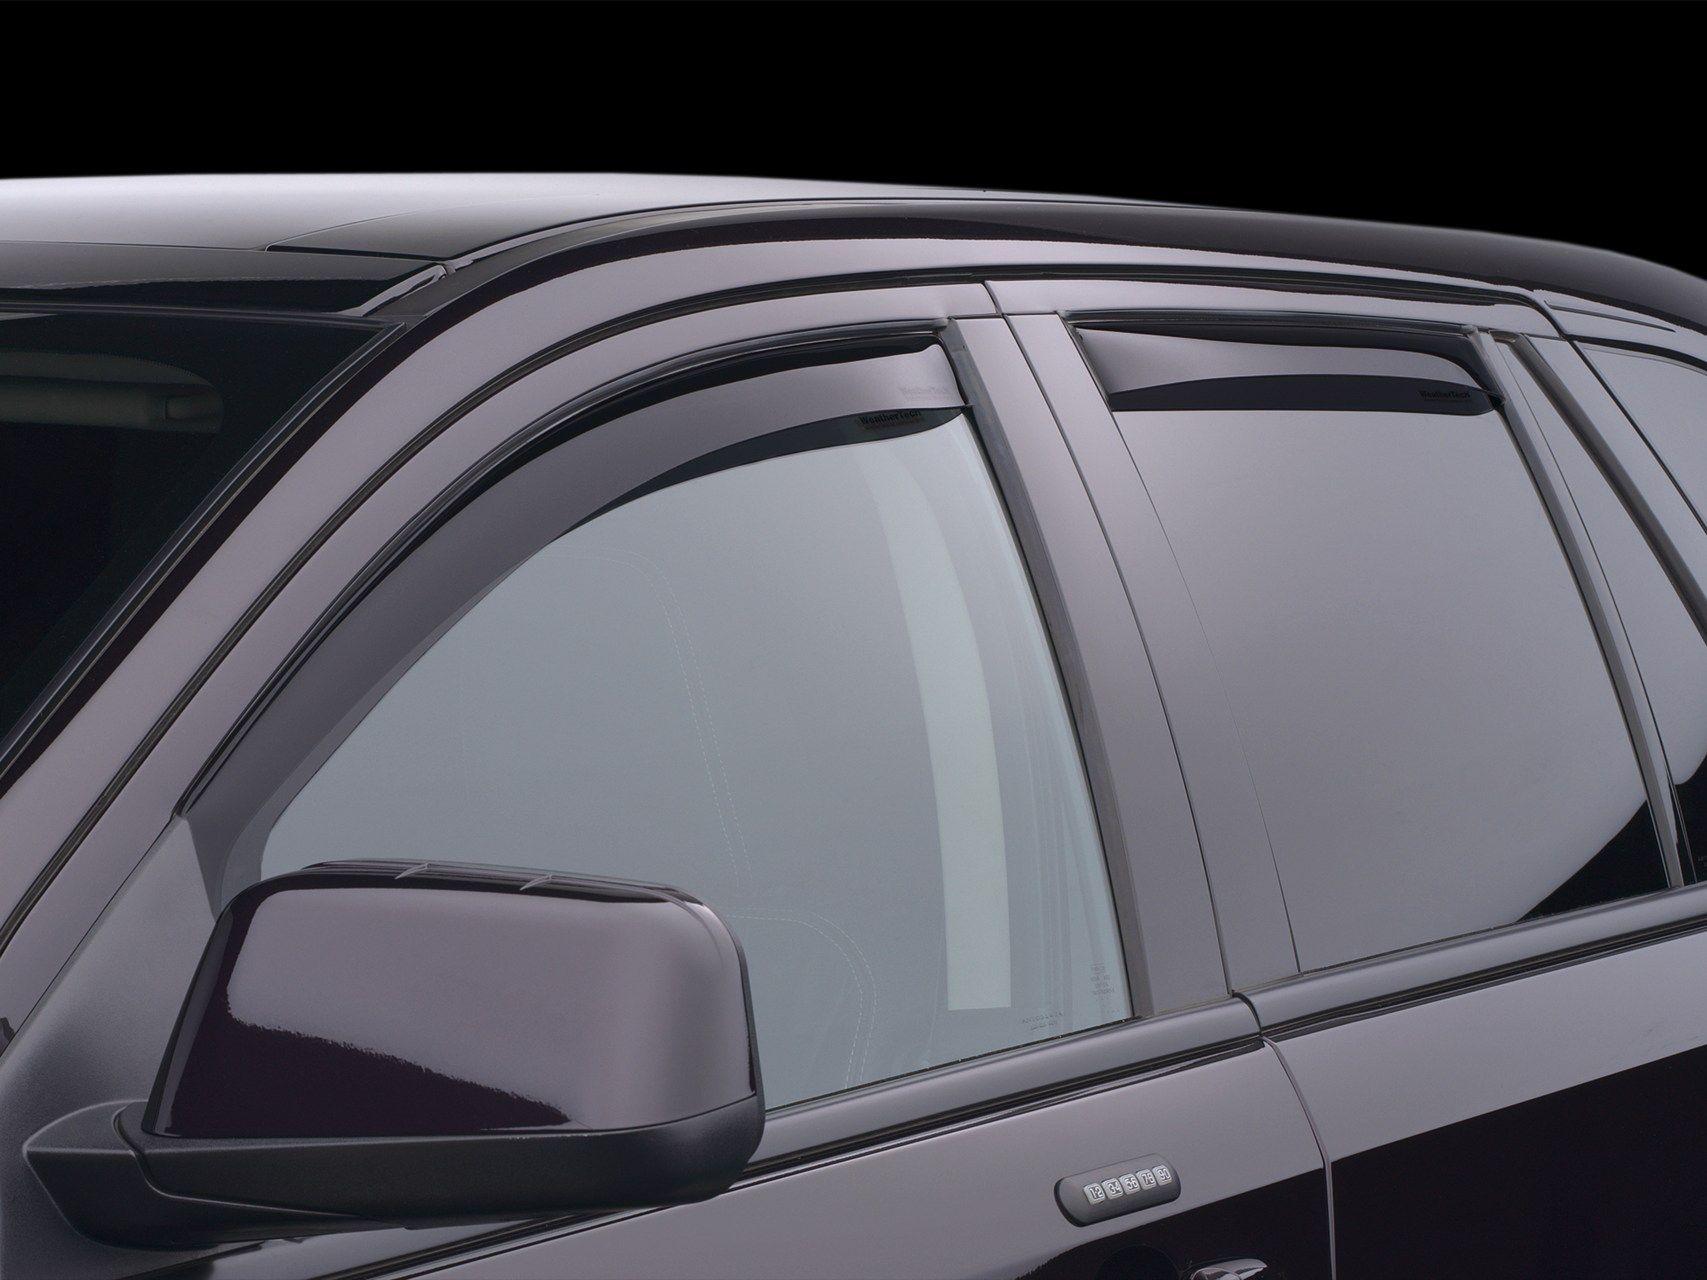 WeatherTech Custom Fit Front /& Rear Side Window Deflectors for Honda Accord Dark Smoke